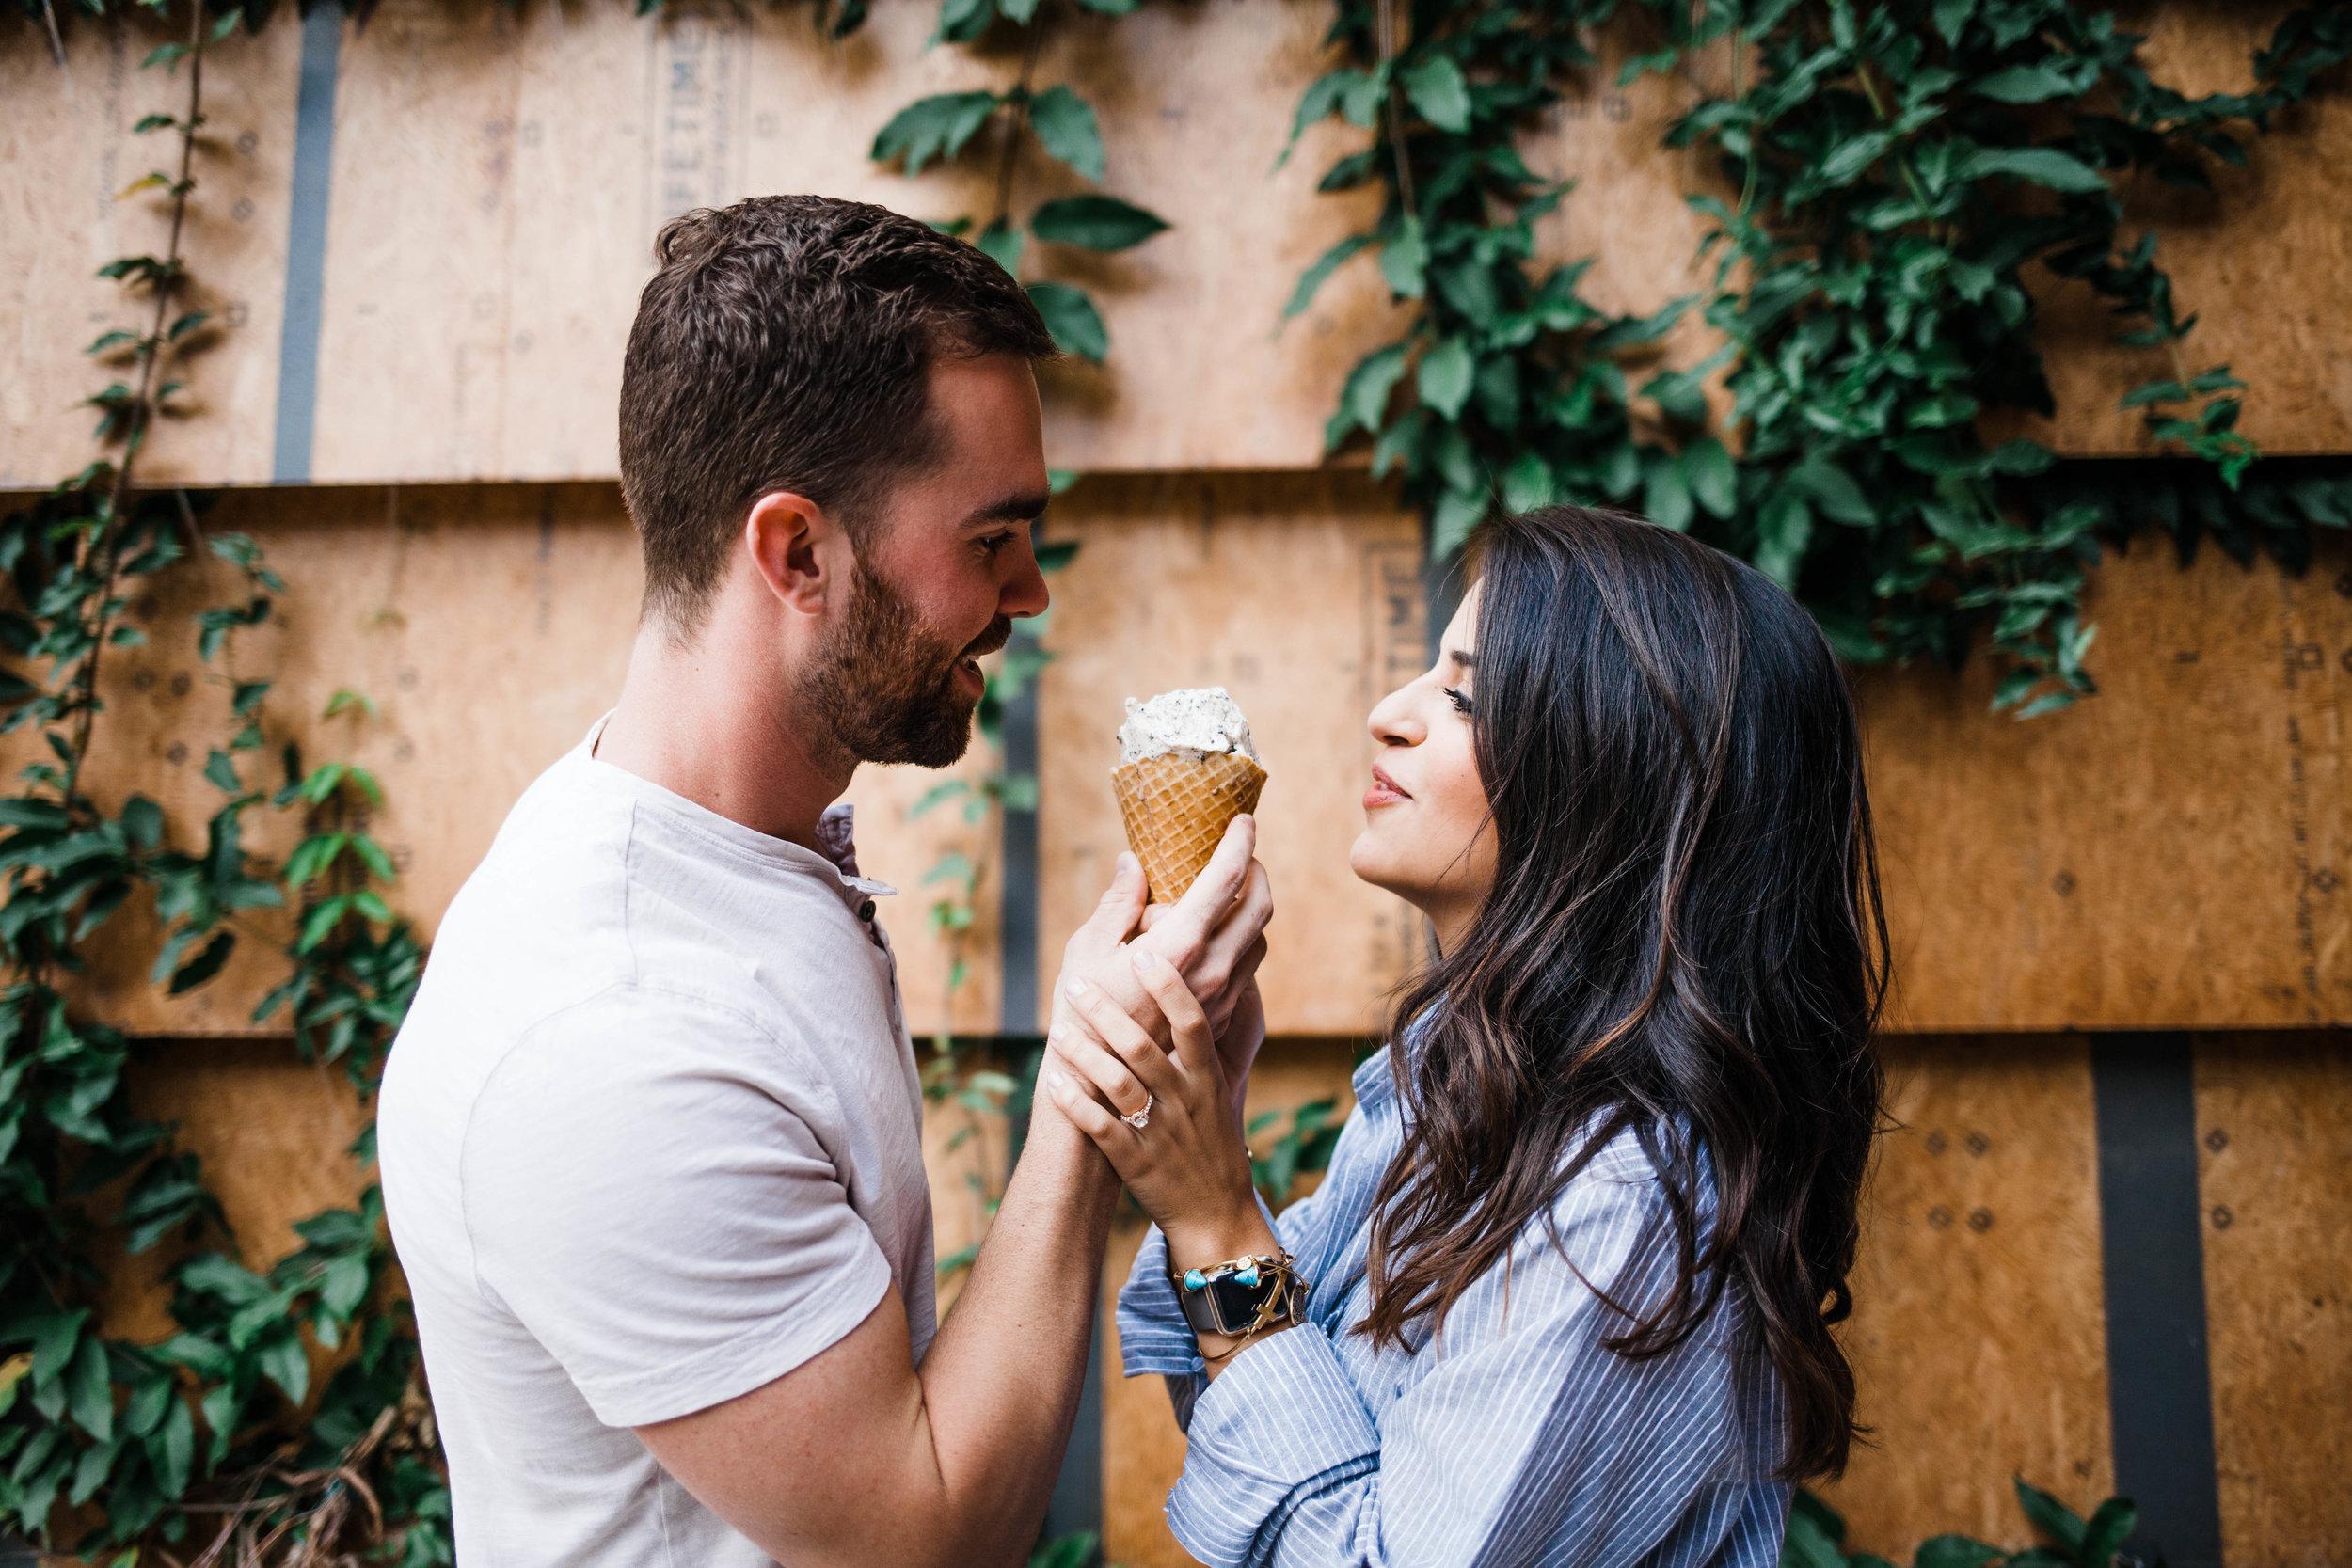 Win + Carla - Ice Cream Kisses + Sundown Cuddles